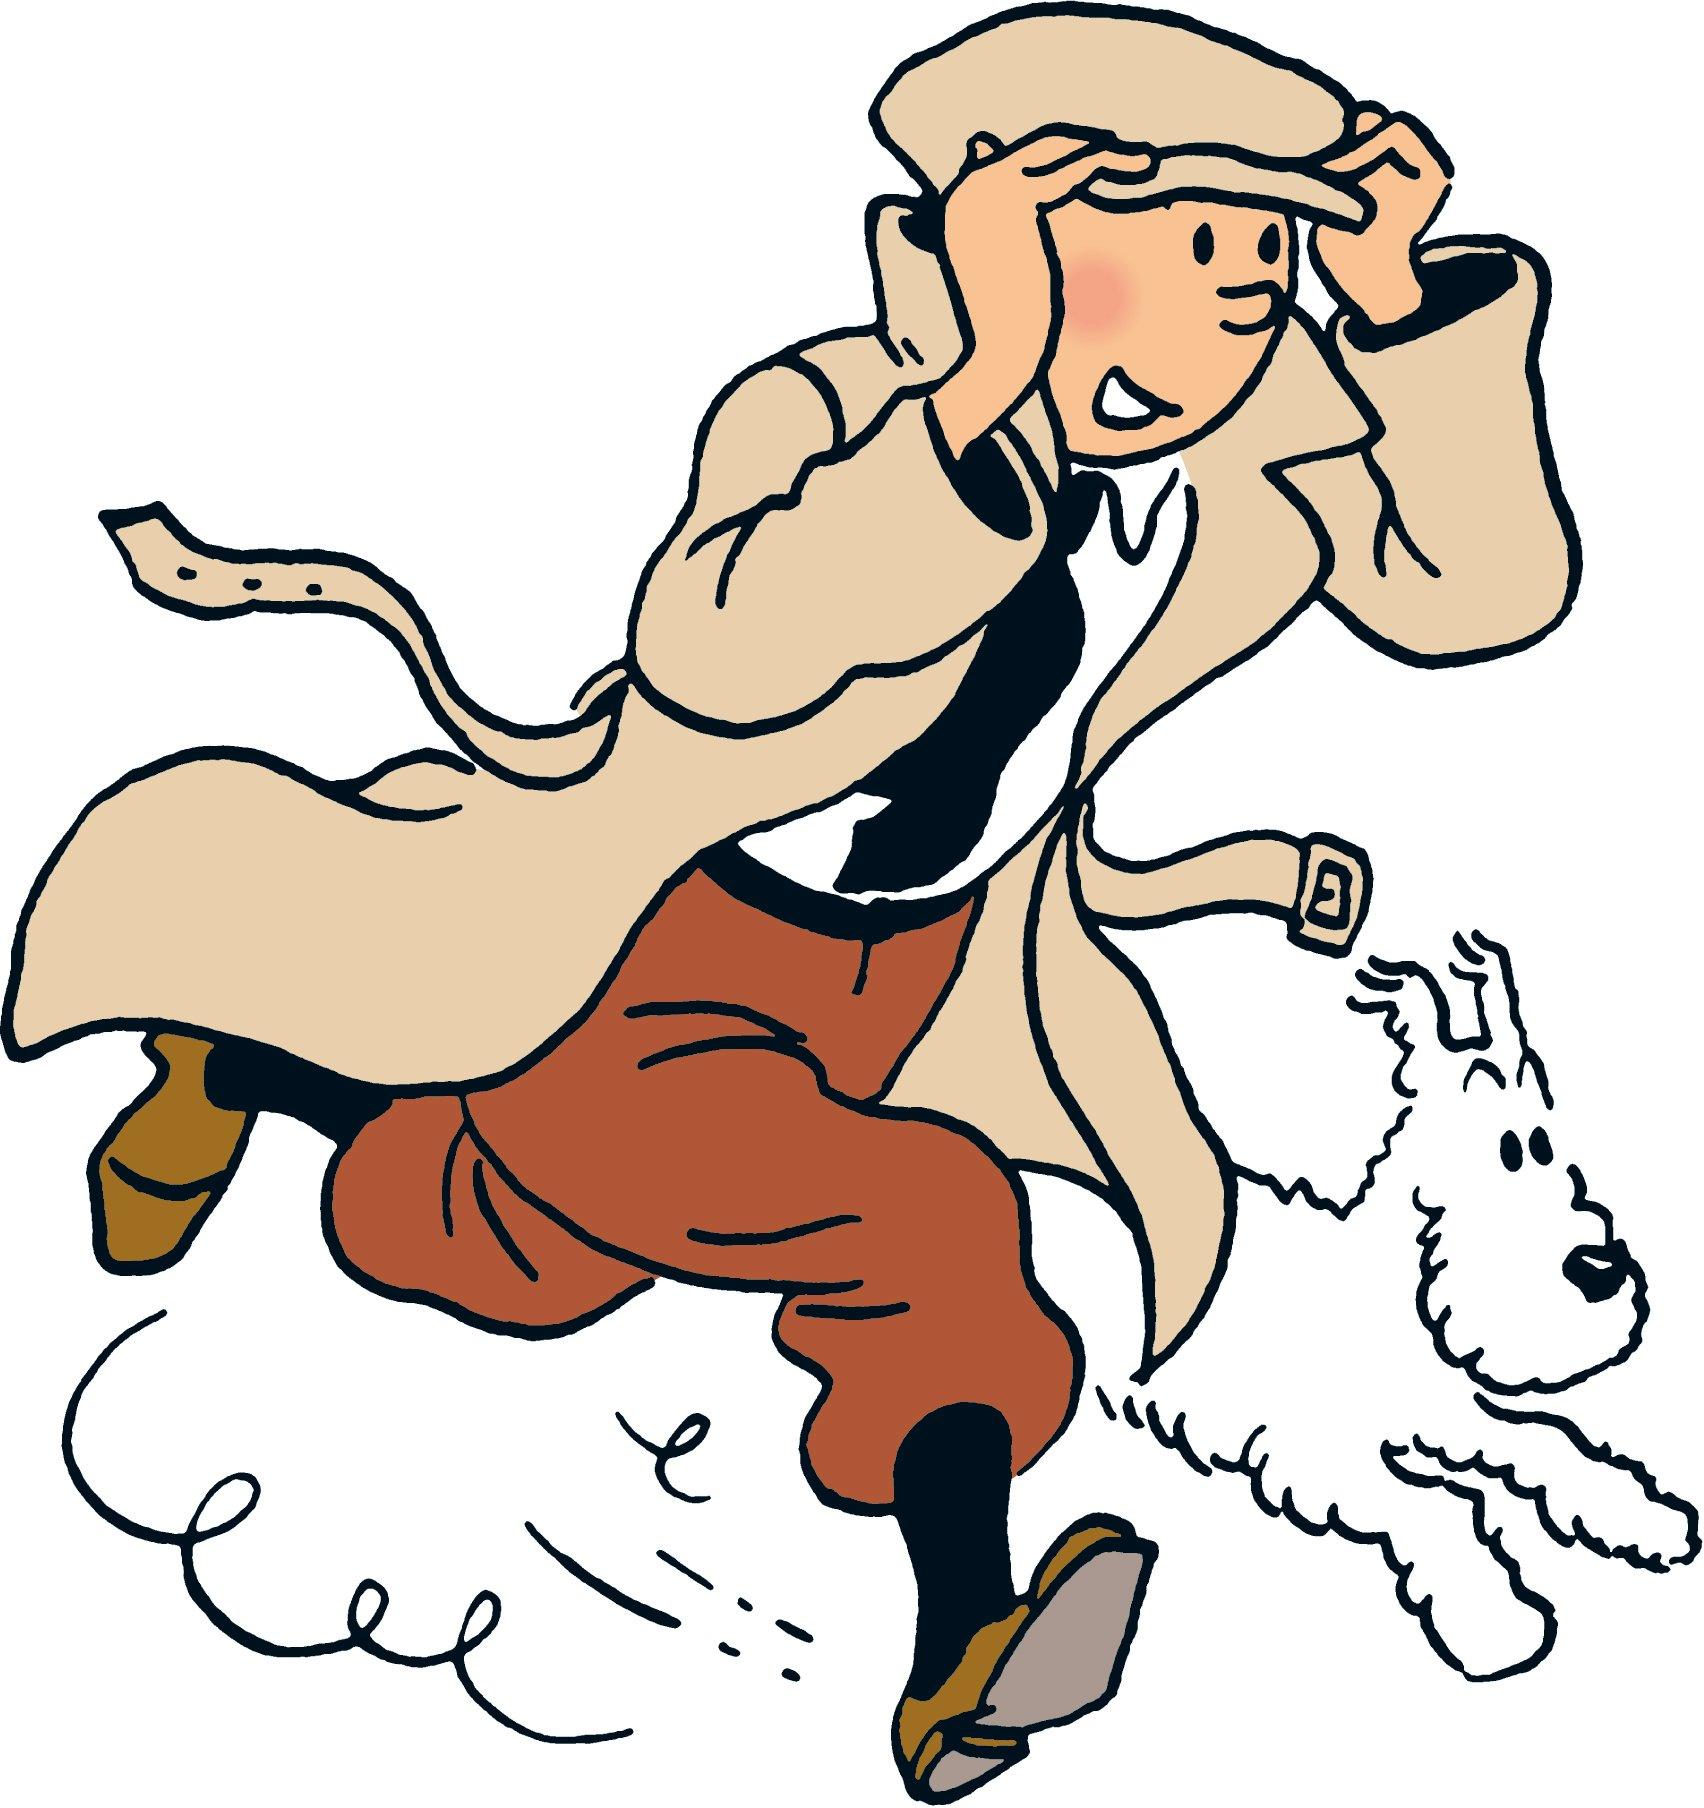 Coloriage tintin et milou imprimer - Tintin gratuit ...